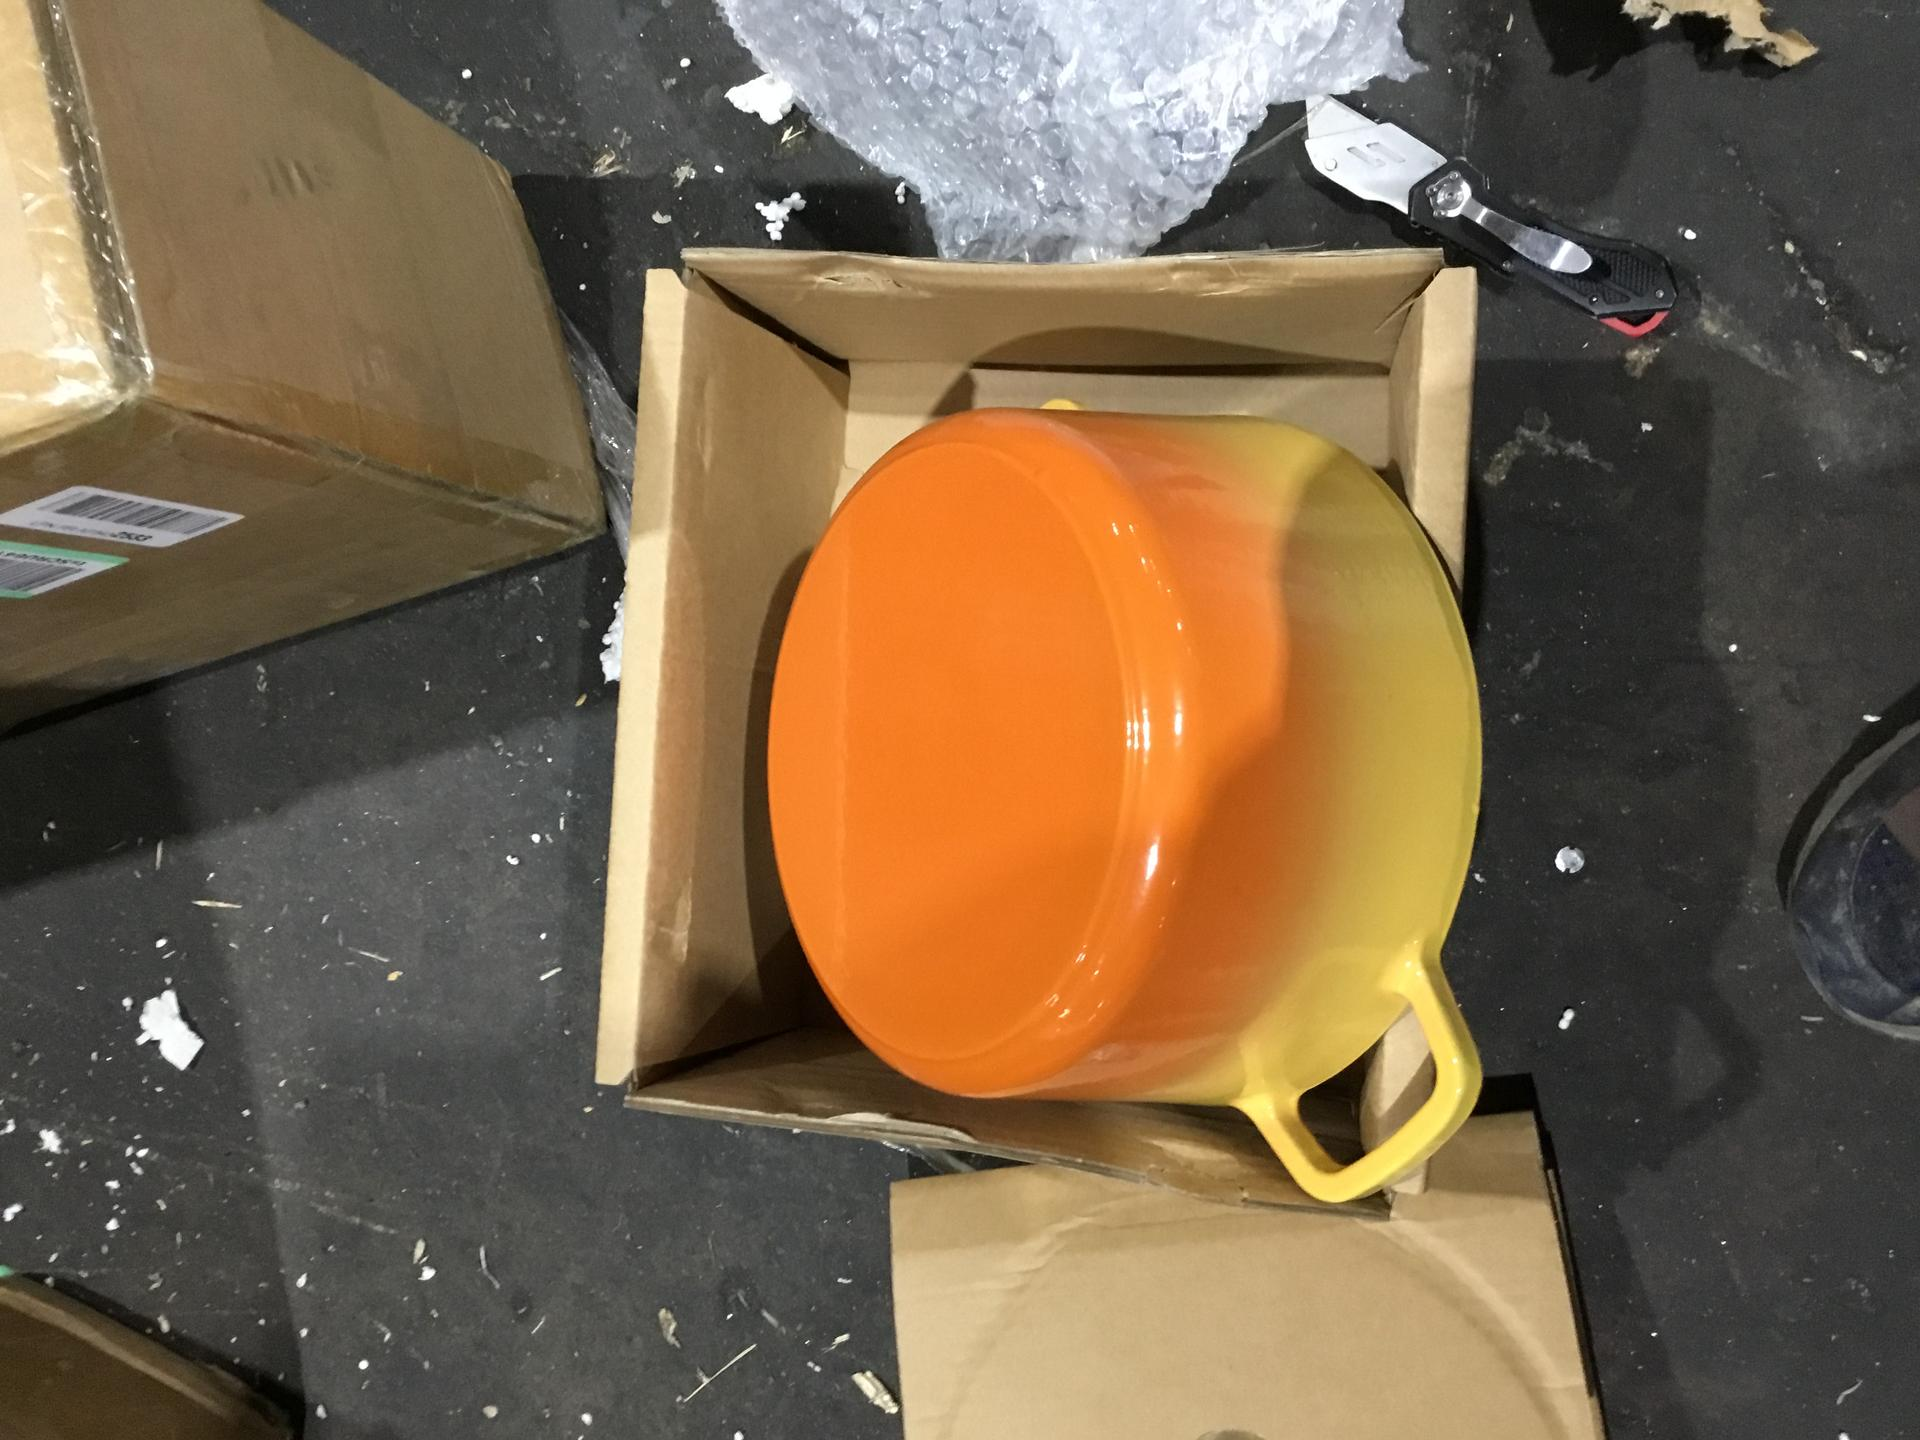 Crock-Pot Artisan Round Enameled Cast Iron Dutch Oven, 5-Quart, Sunset Orange